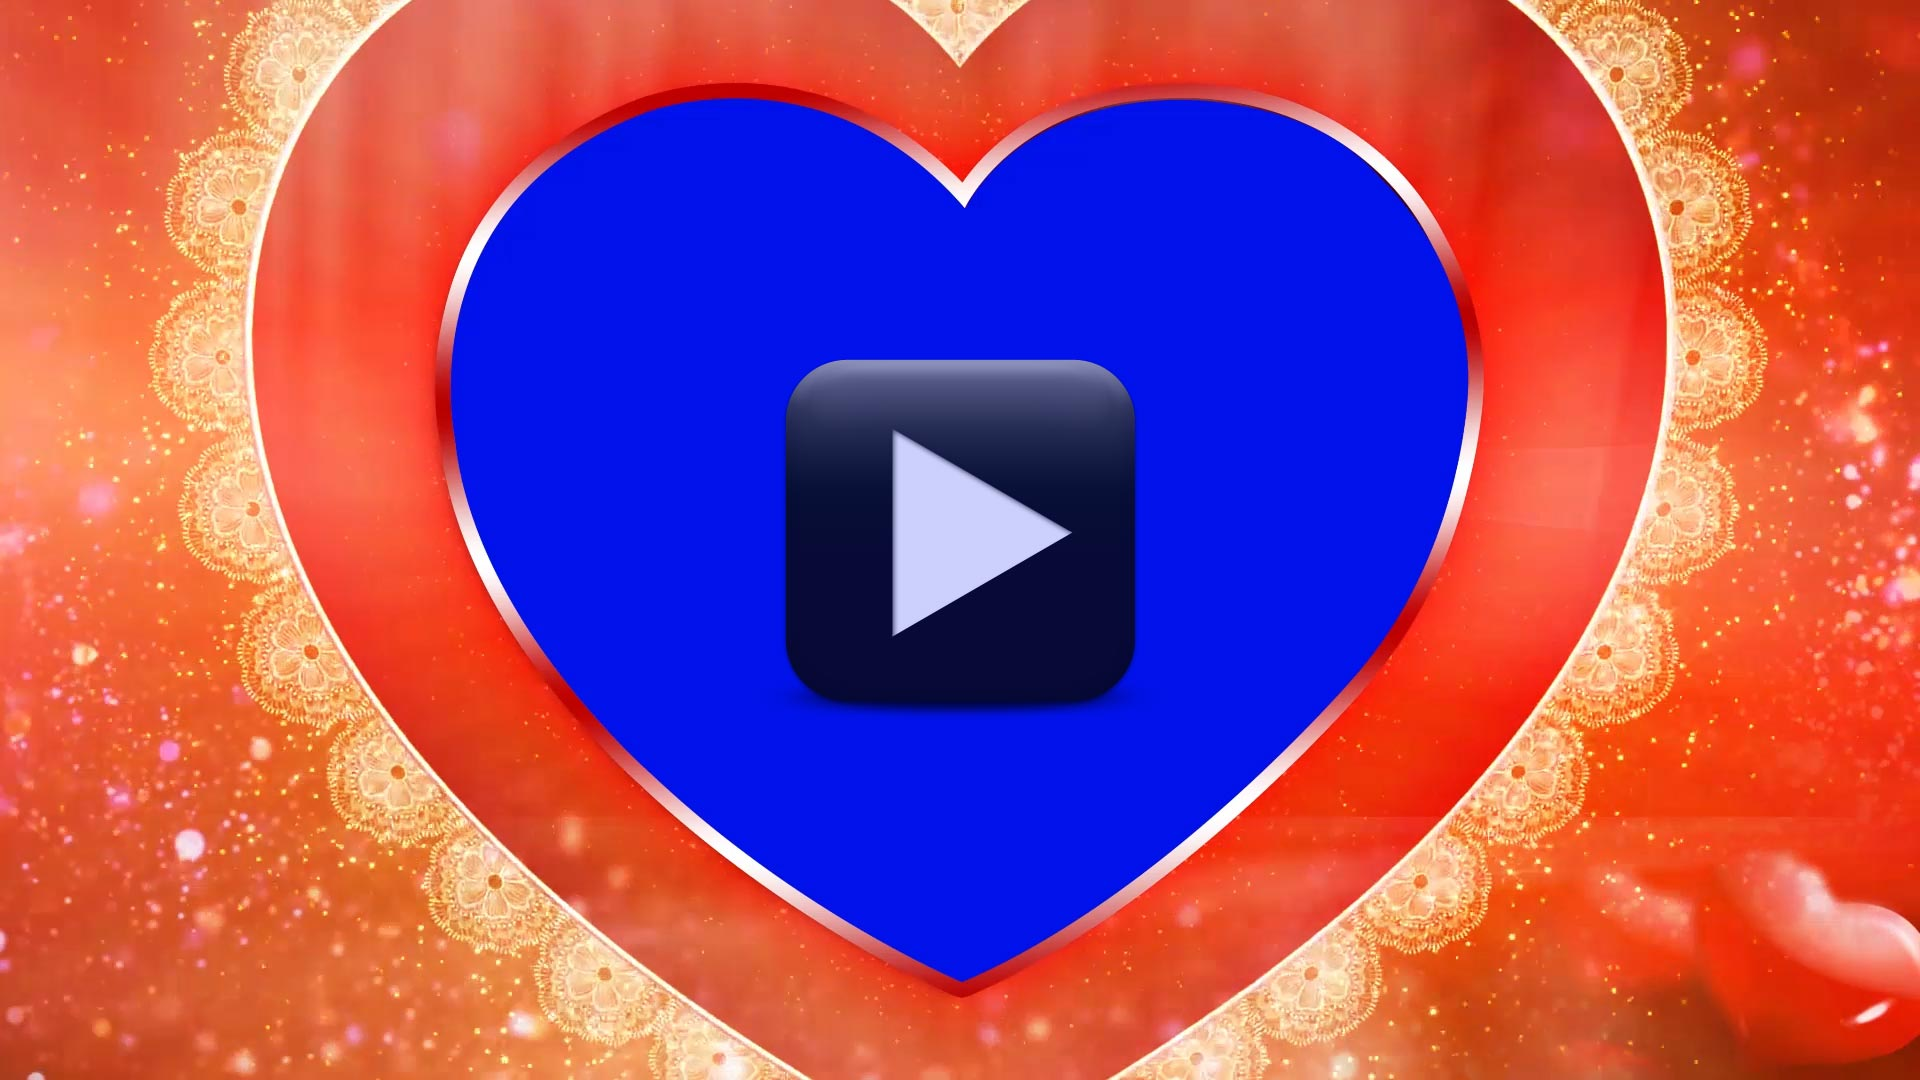 Wedding Video Background-Free Video Graphics